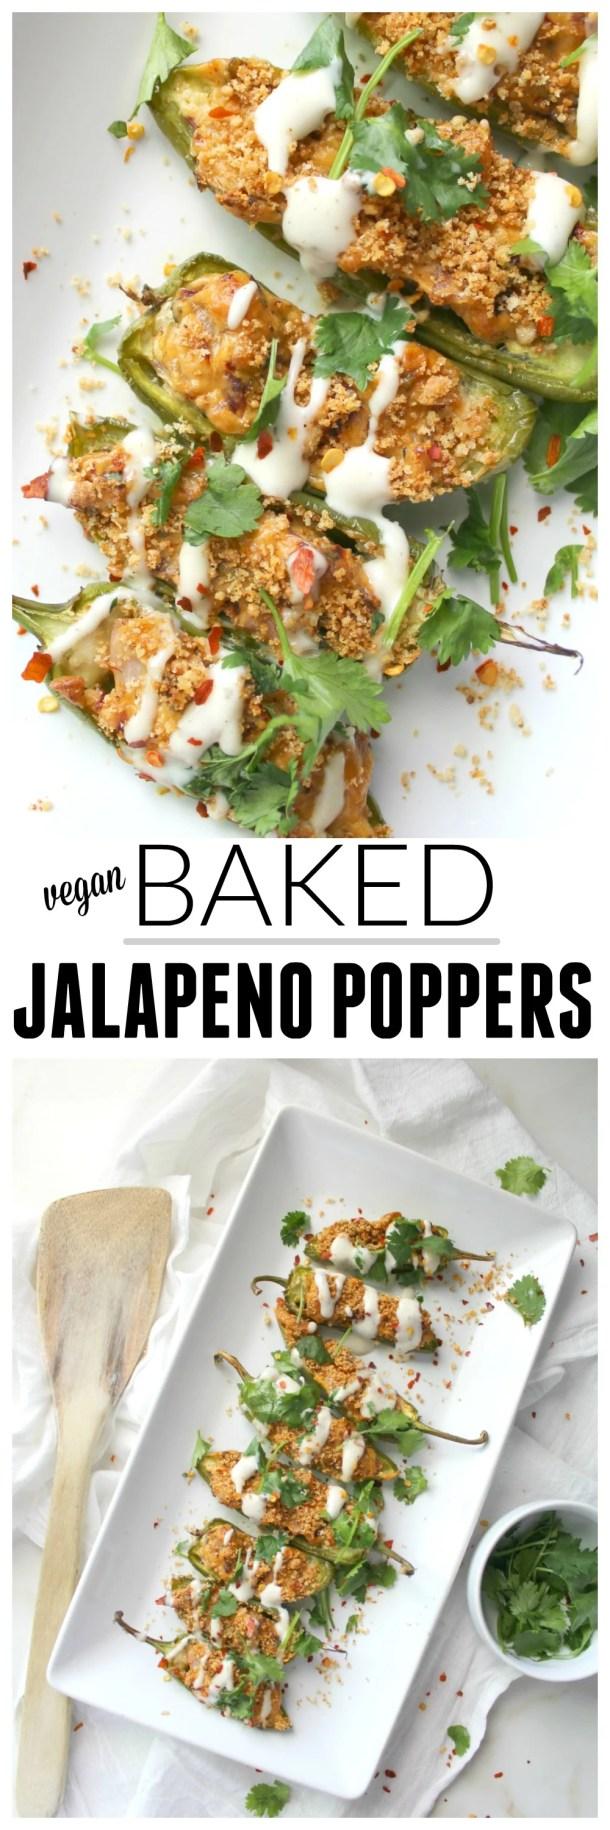 Vegan Baked Jalapeno Poppers | ThisSavoryVegan.com